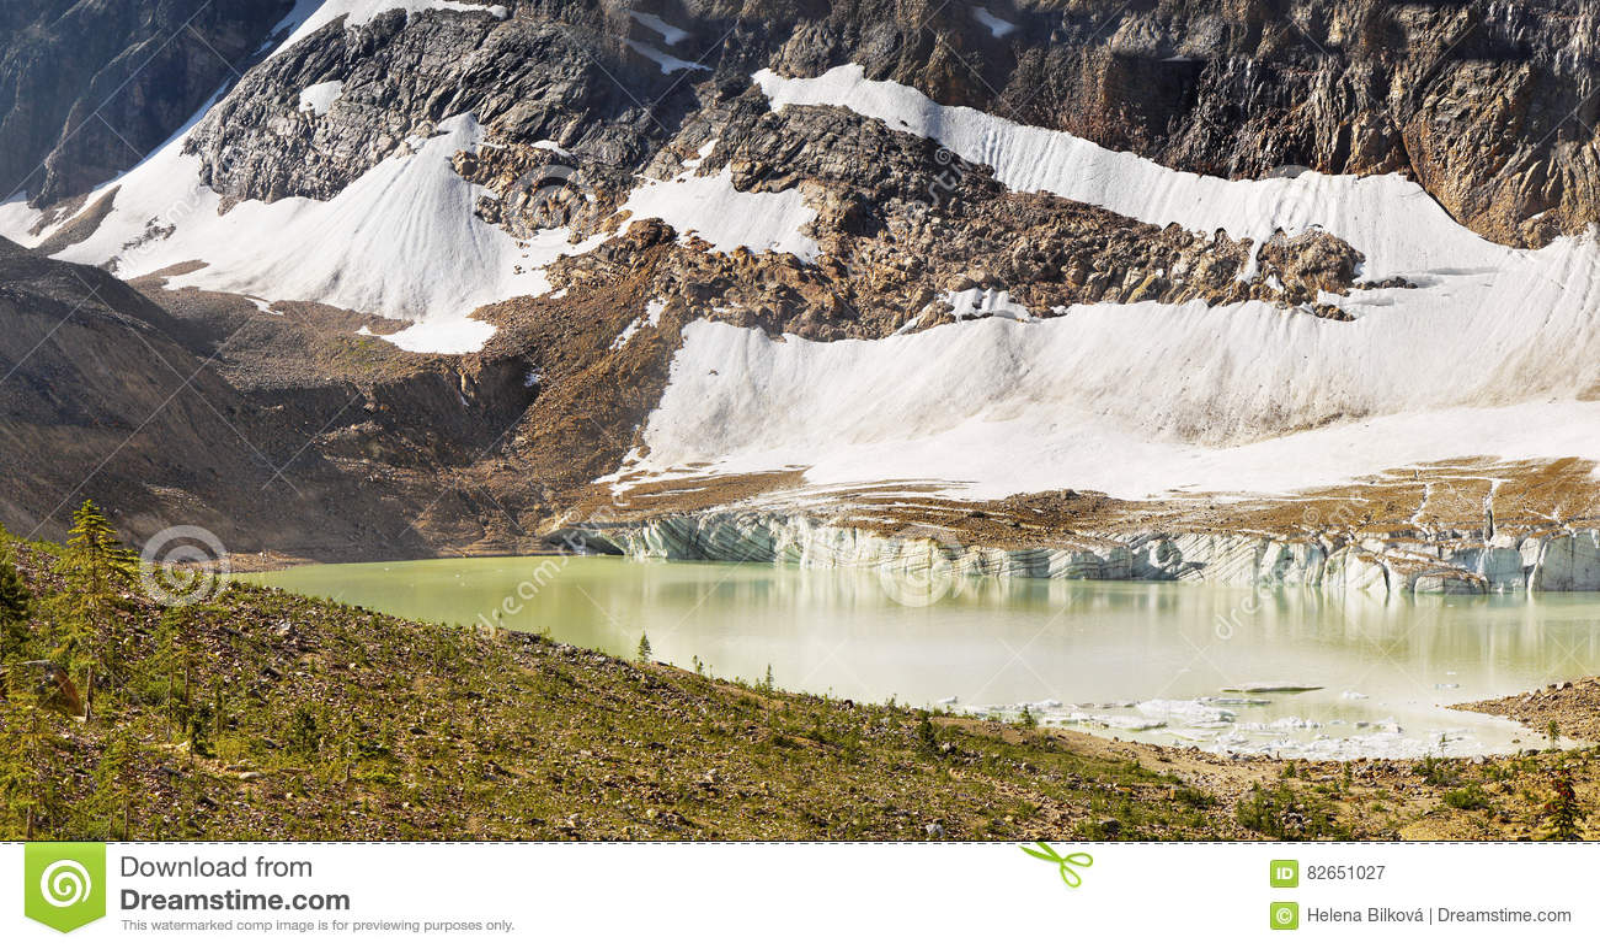 Mountain Range landscape, Rocky Mountains, Canada